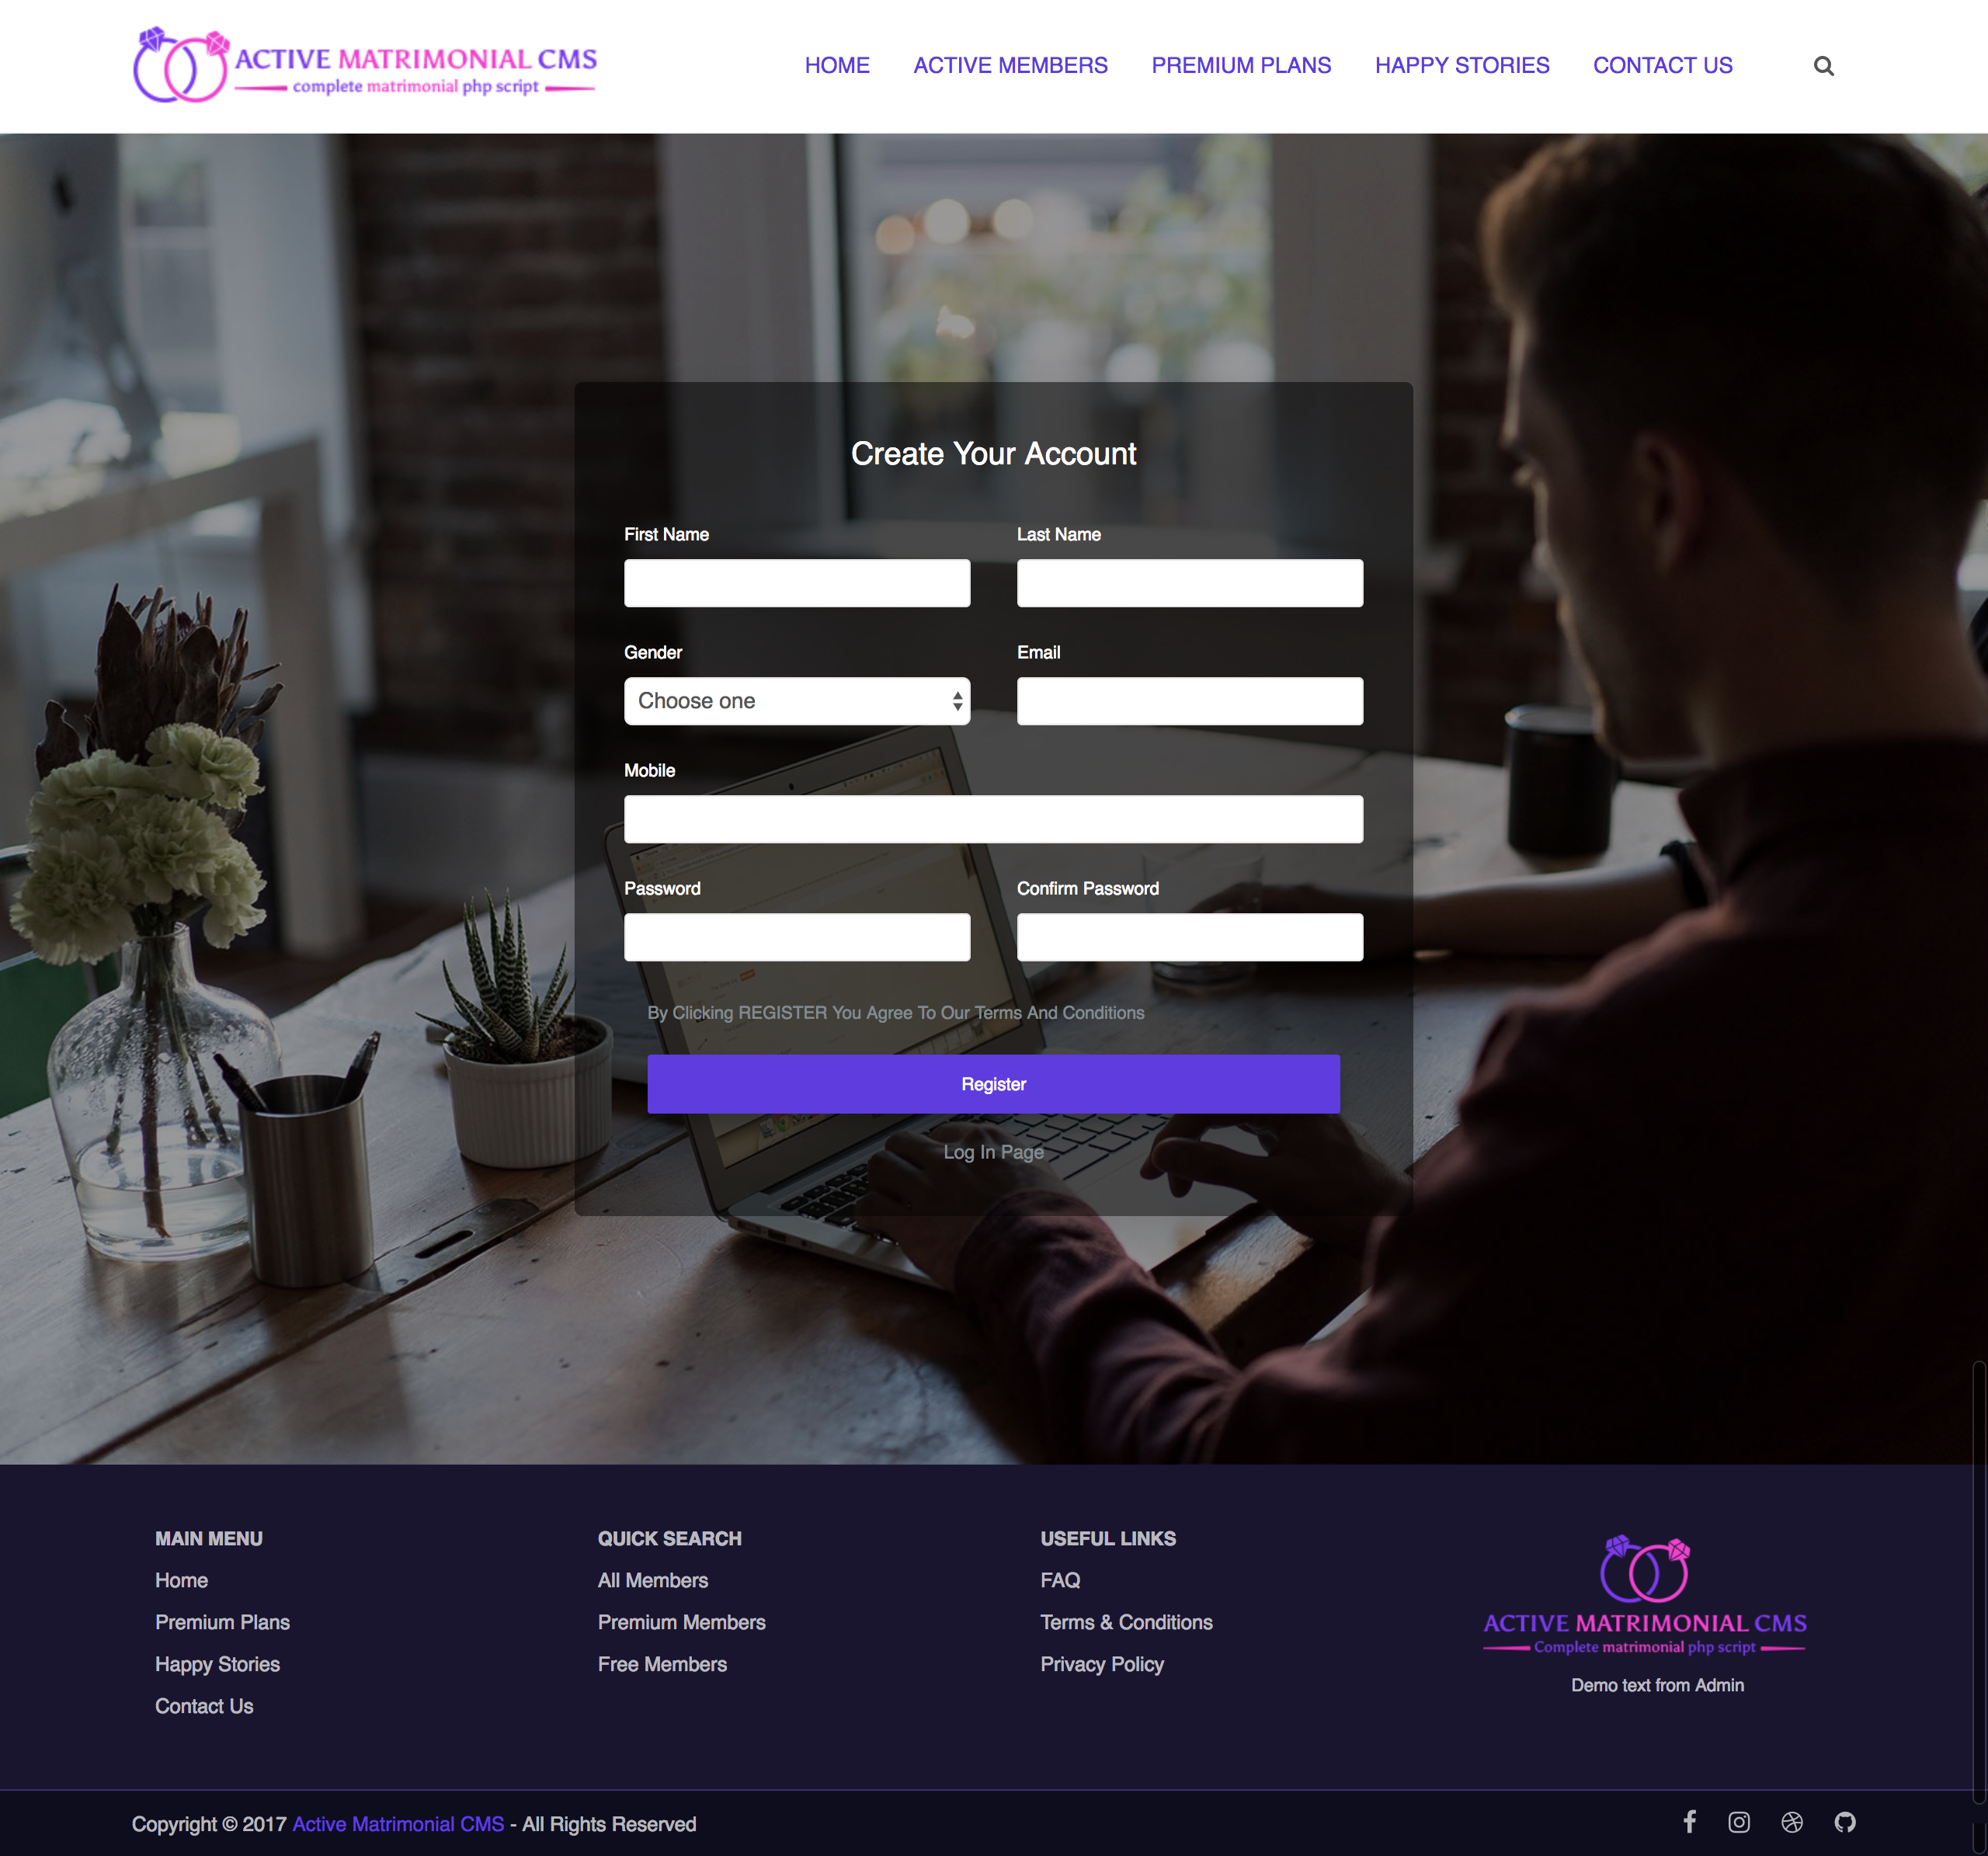 Active Matrimonial CMS by ActiveITzone | CodeCanyon